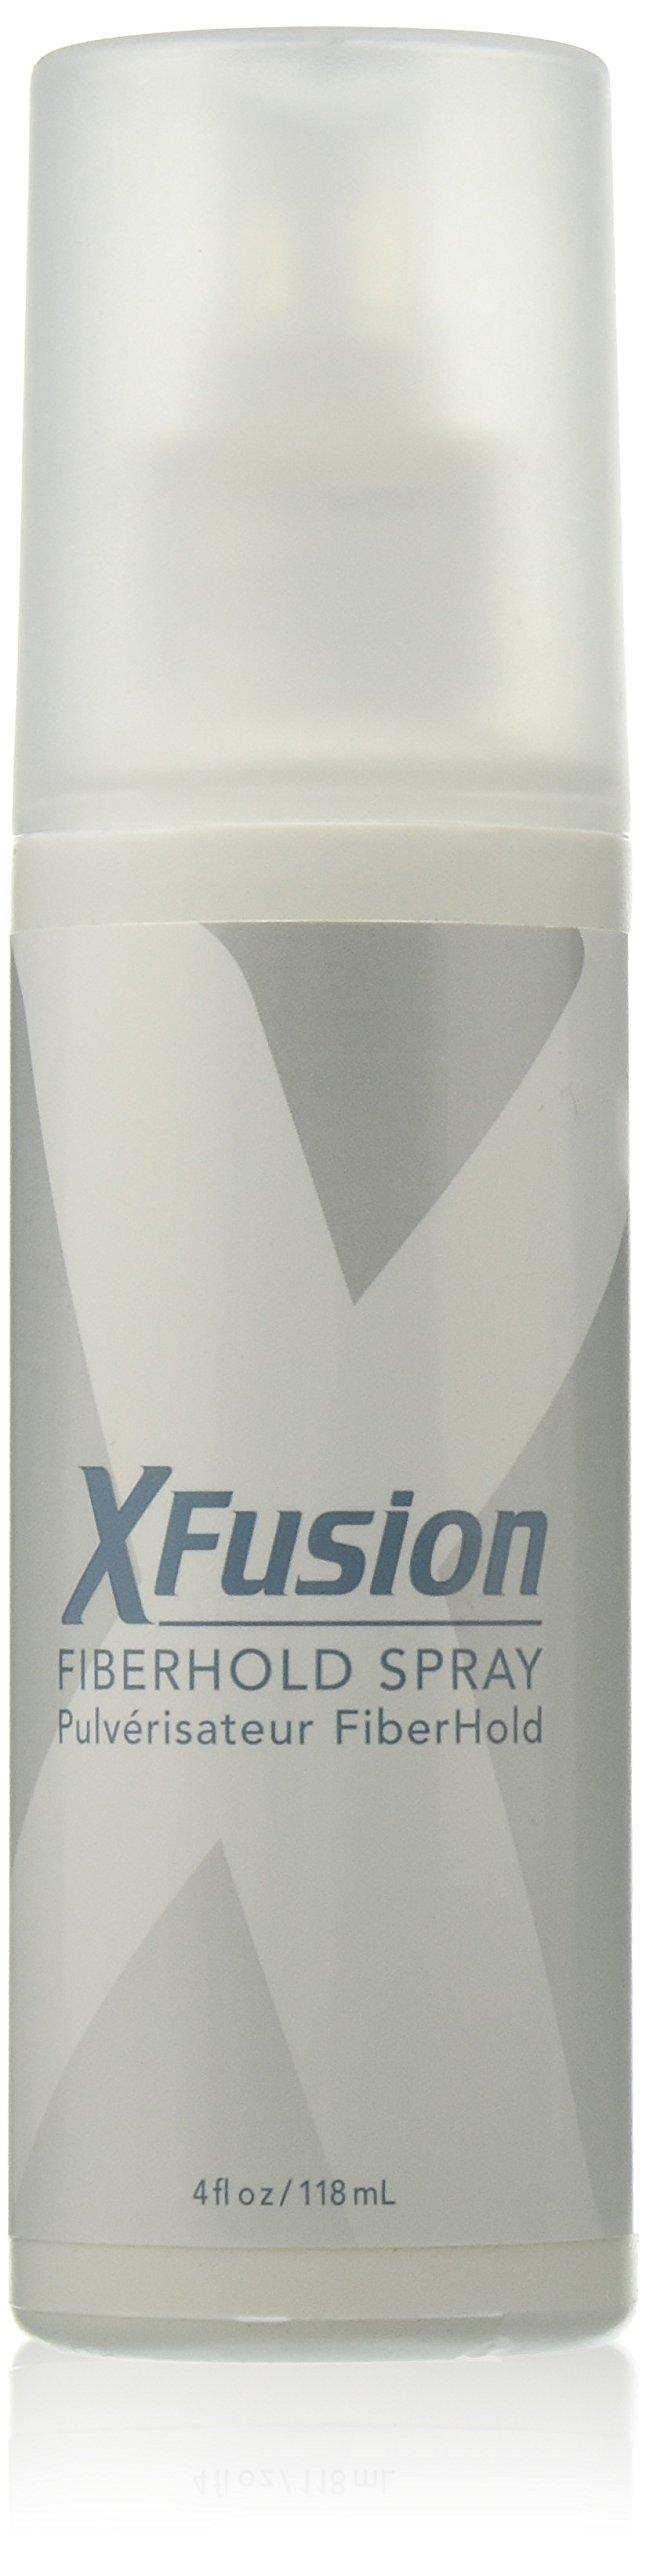 XFusion Fiber Hold Spray, 4 Ounce